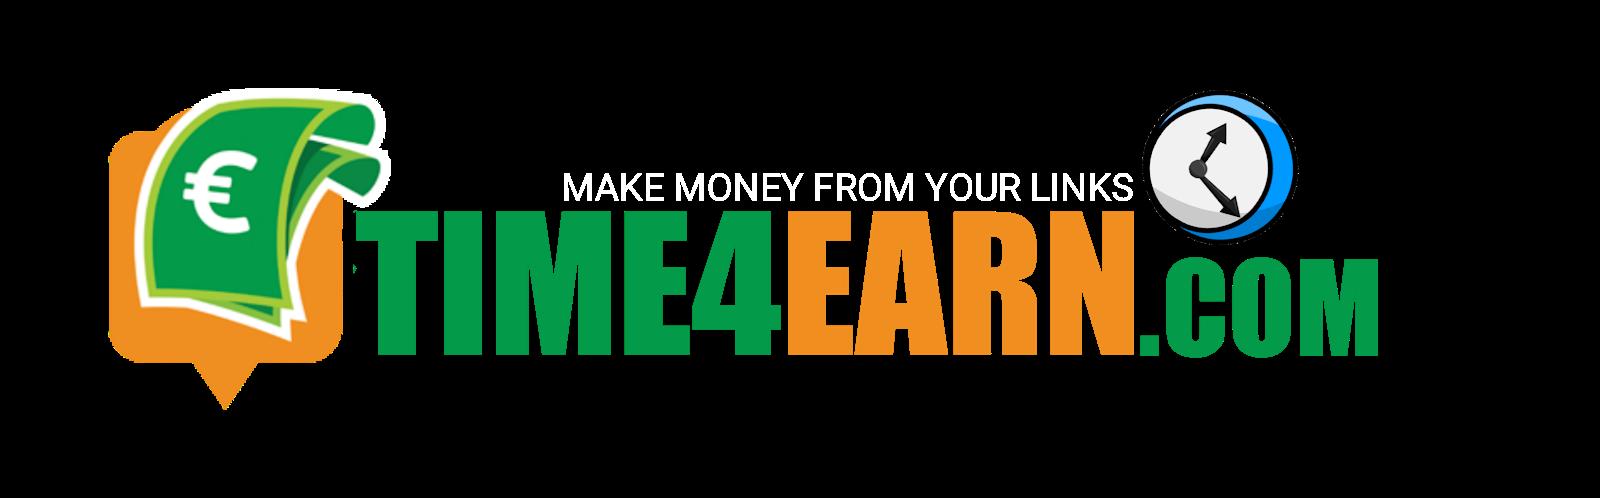 Time 4 Earn